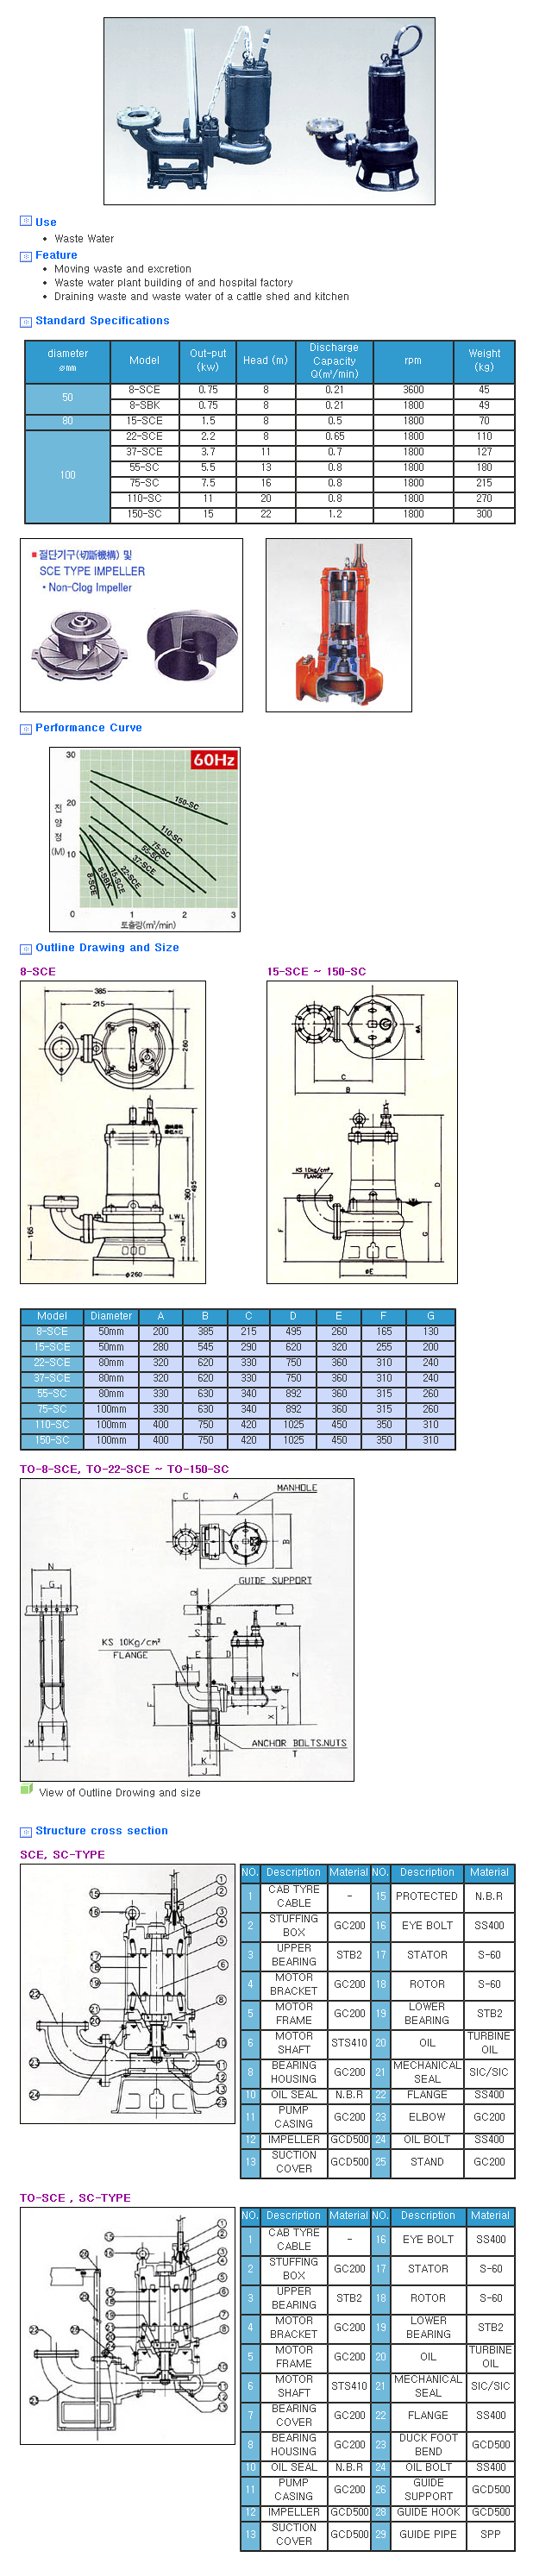 Shinshin Pump Manufacturing Co. Submersible Cutter Pump SCE